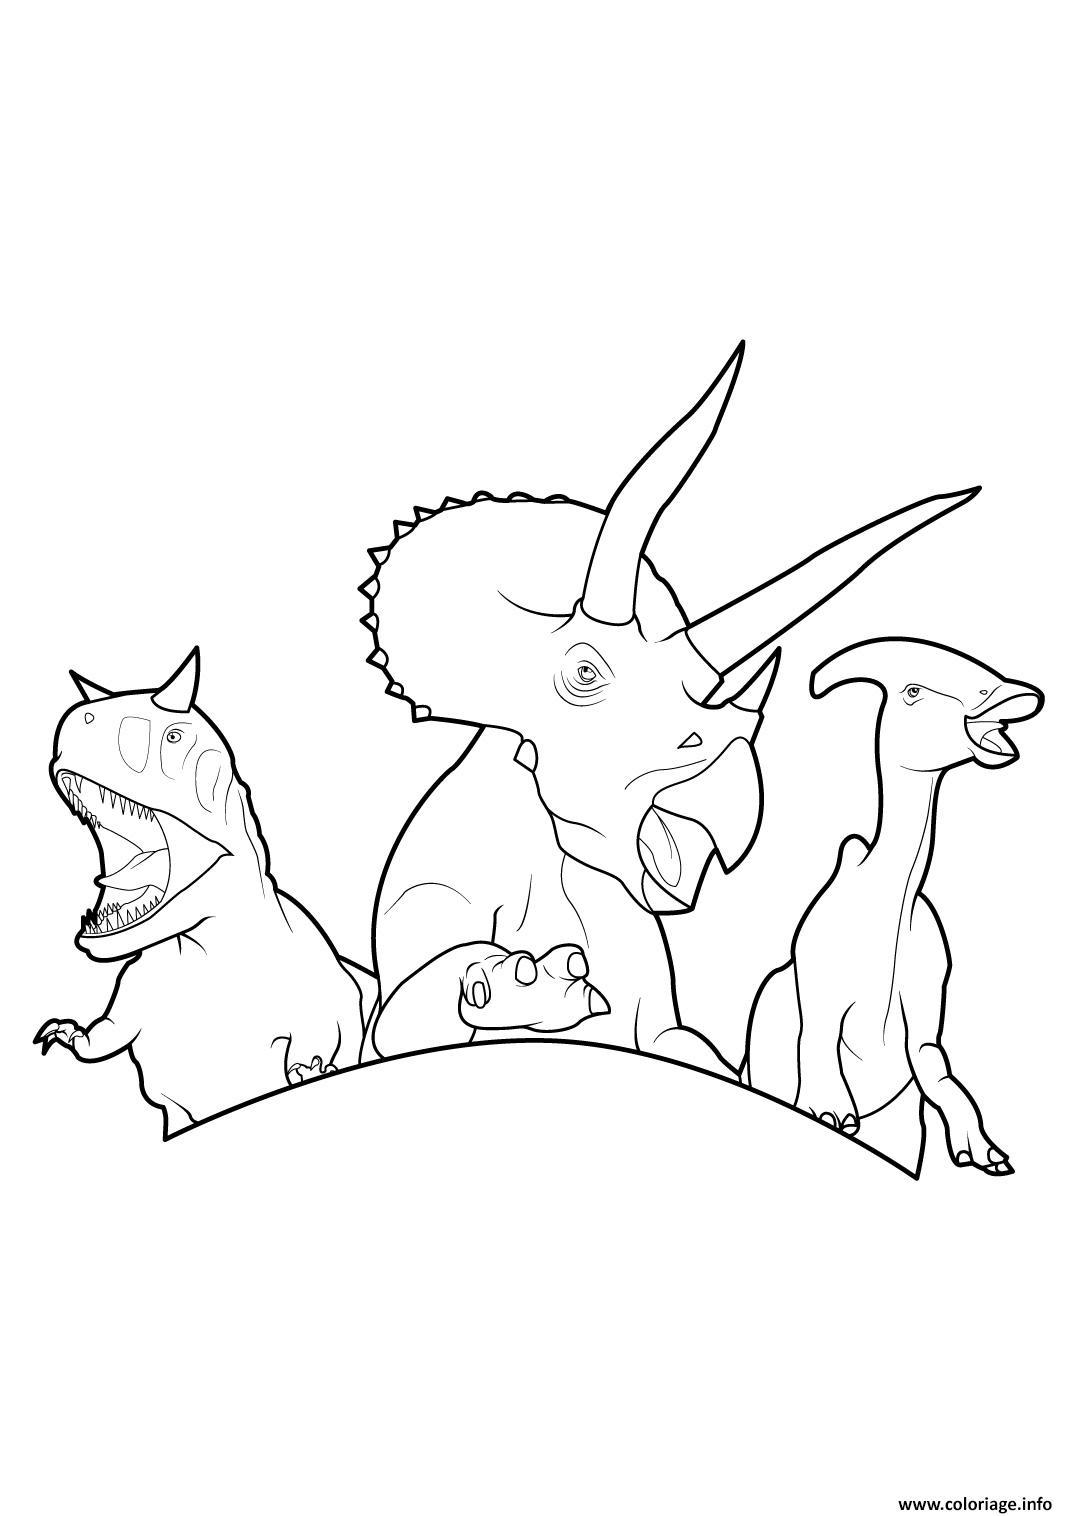 Coloriage dinosaure 363 - Dessin de dinosaure a imprimer ...